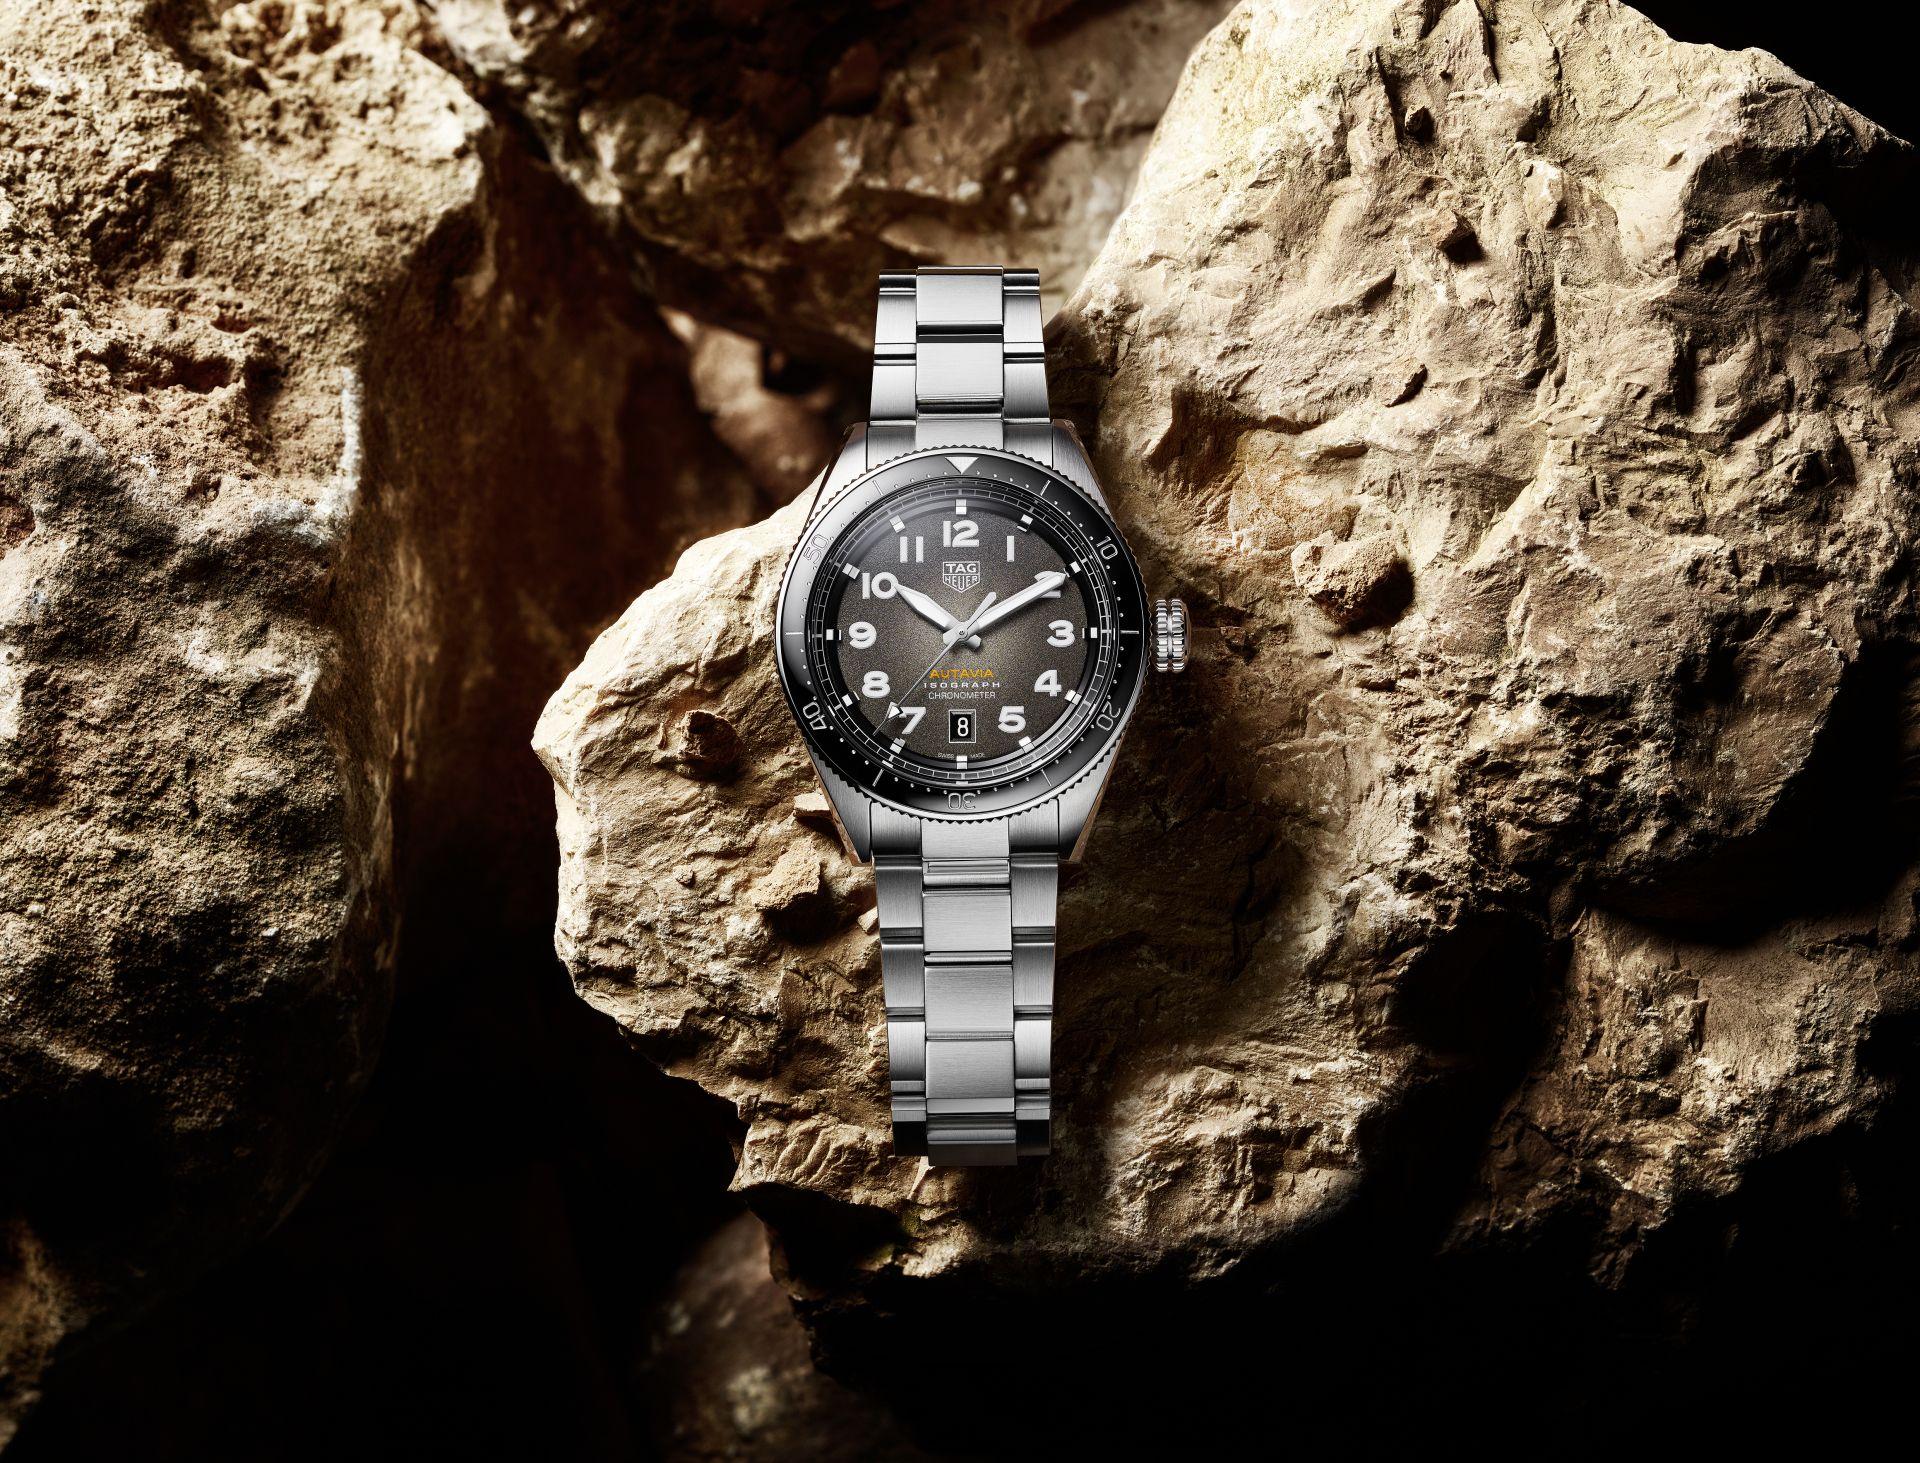 Baselworld: TAG Heuer Reintroduces Iconic Autavia Model